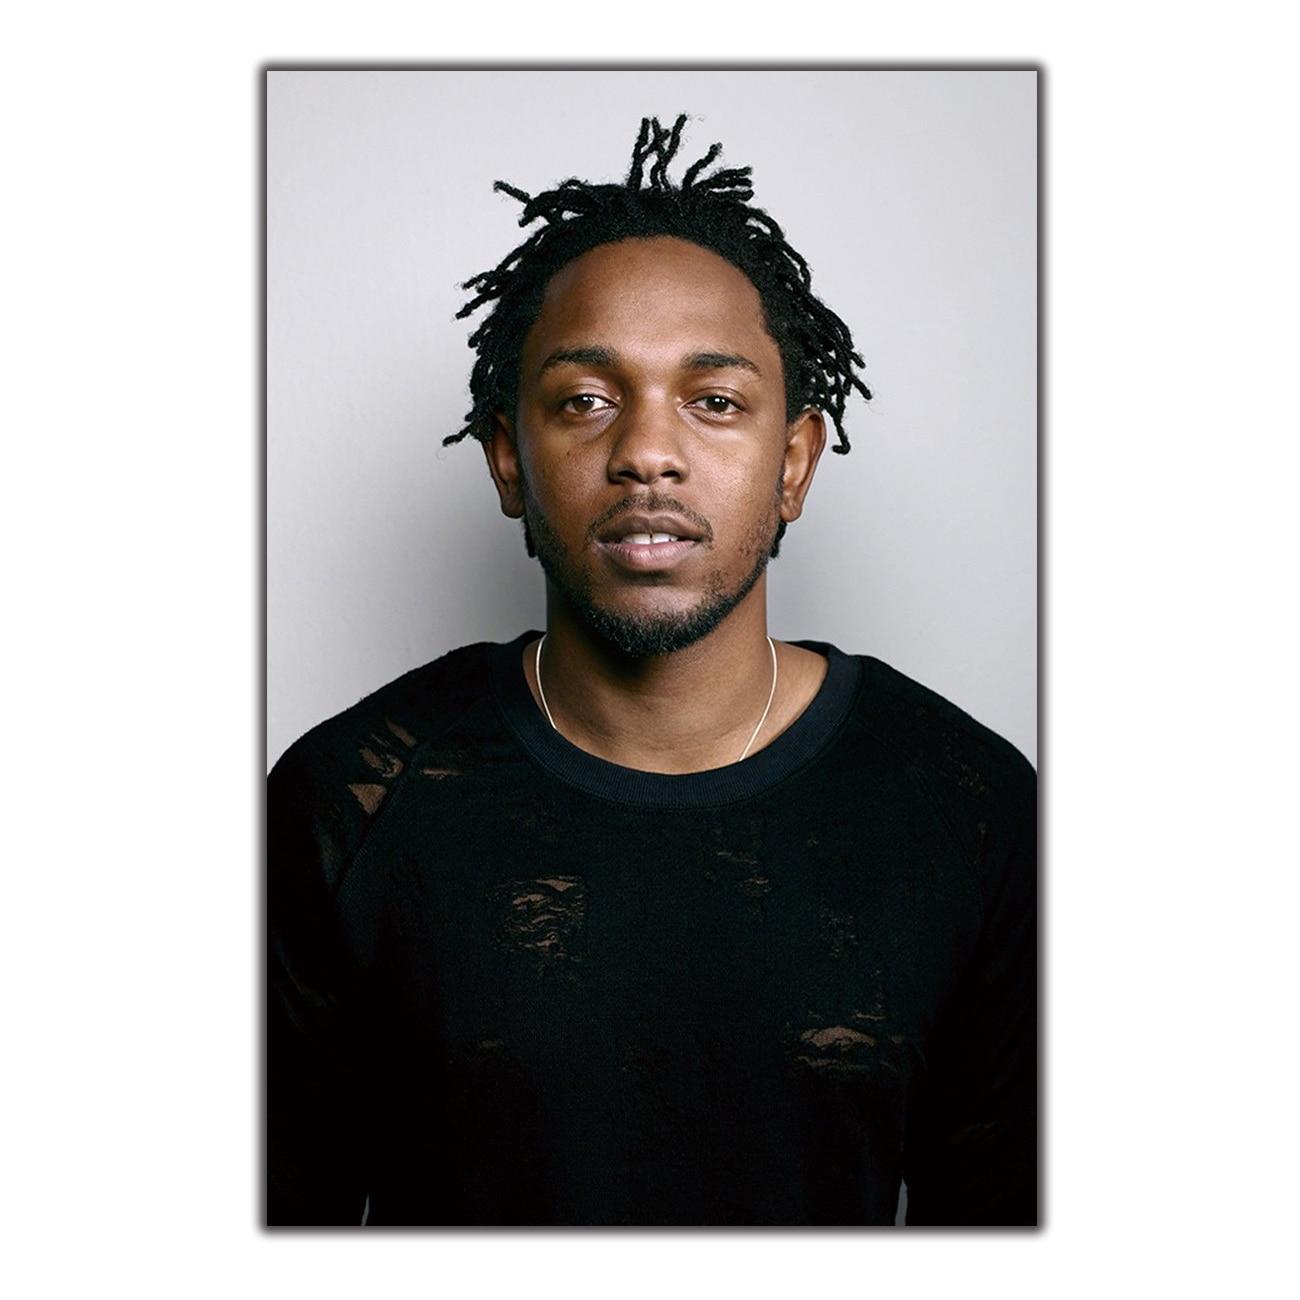 Arte do Cartaz Música Cantor de Hip Hop Rapper Kendrick Lamar Casa Decor14x21 12x18 24x36 27x40 cópia da Lona De parede Moderna